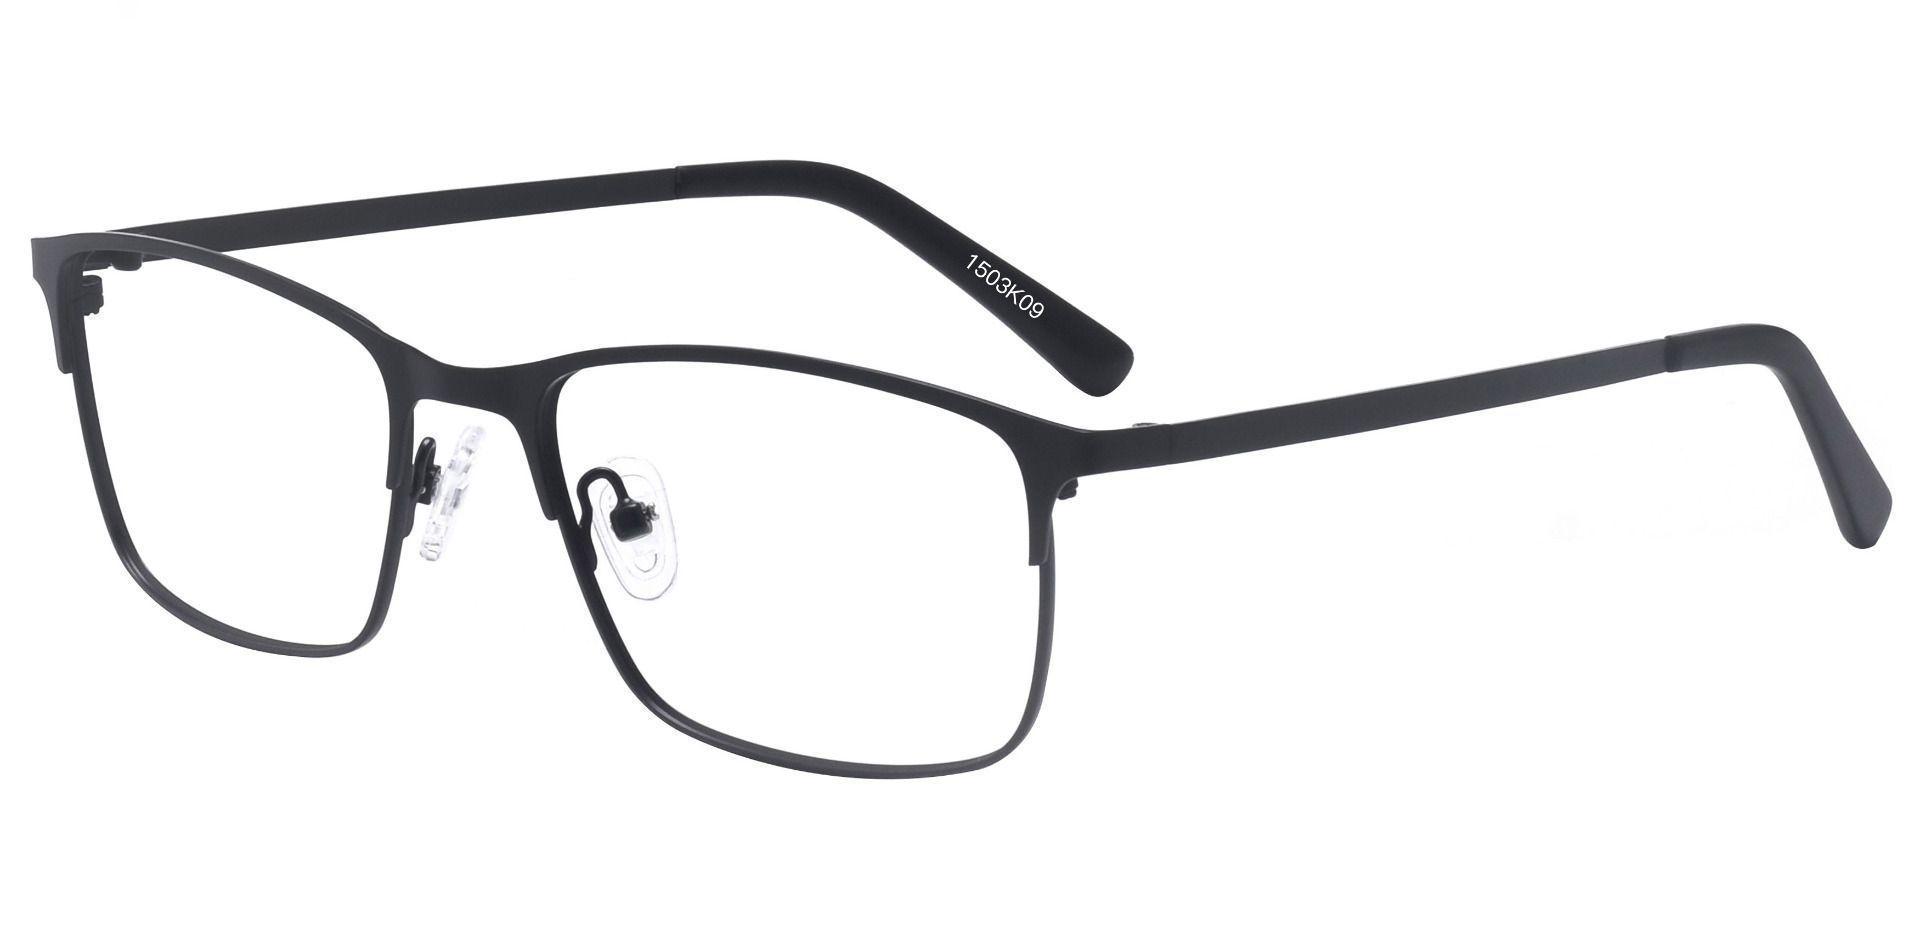 Zachary Rectangle Prescription Glasses - Black